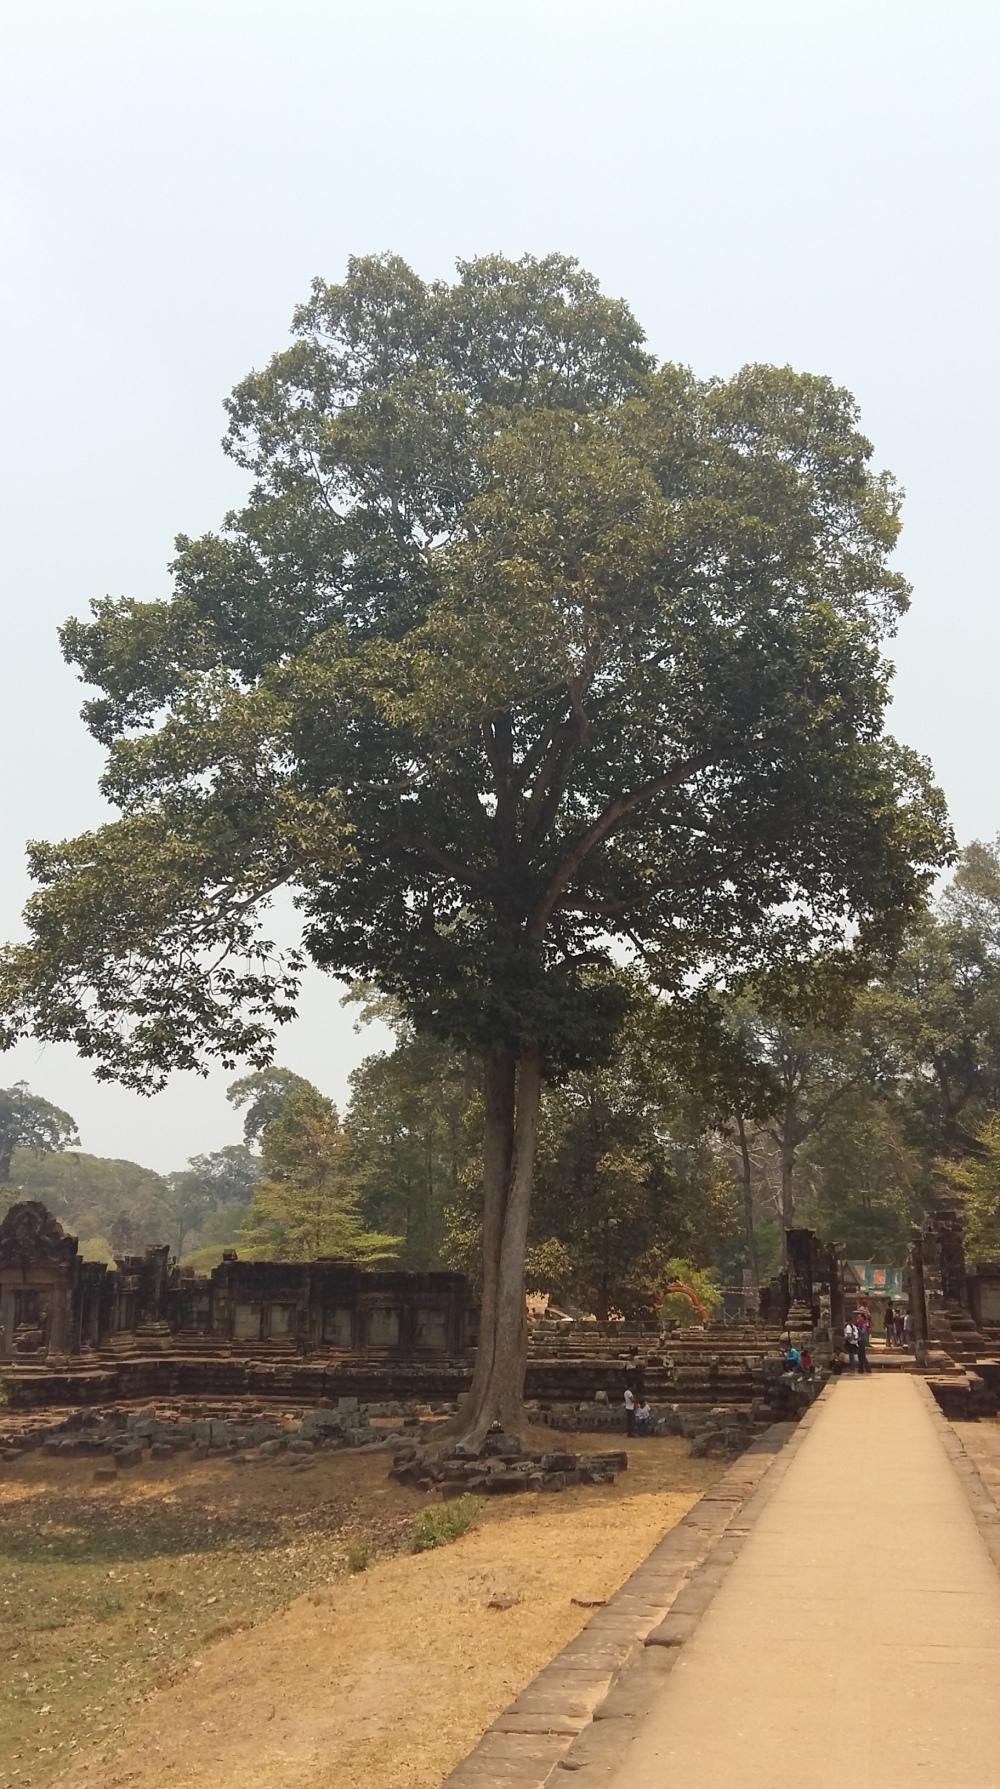 2106_April_12 Bäume 4